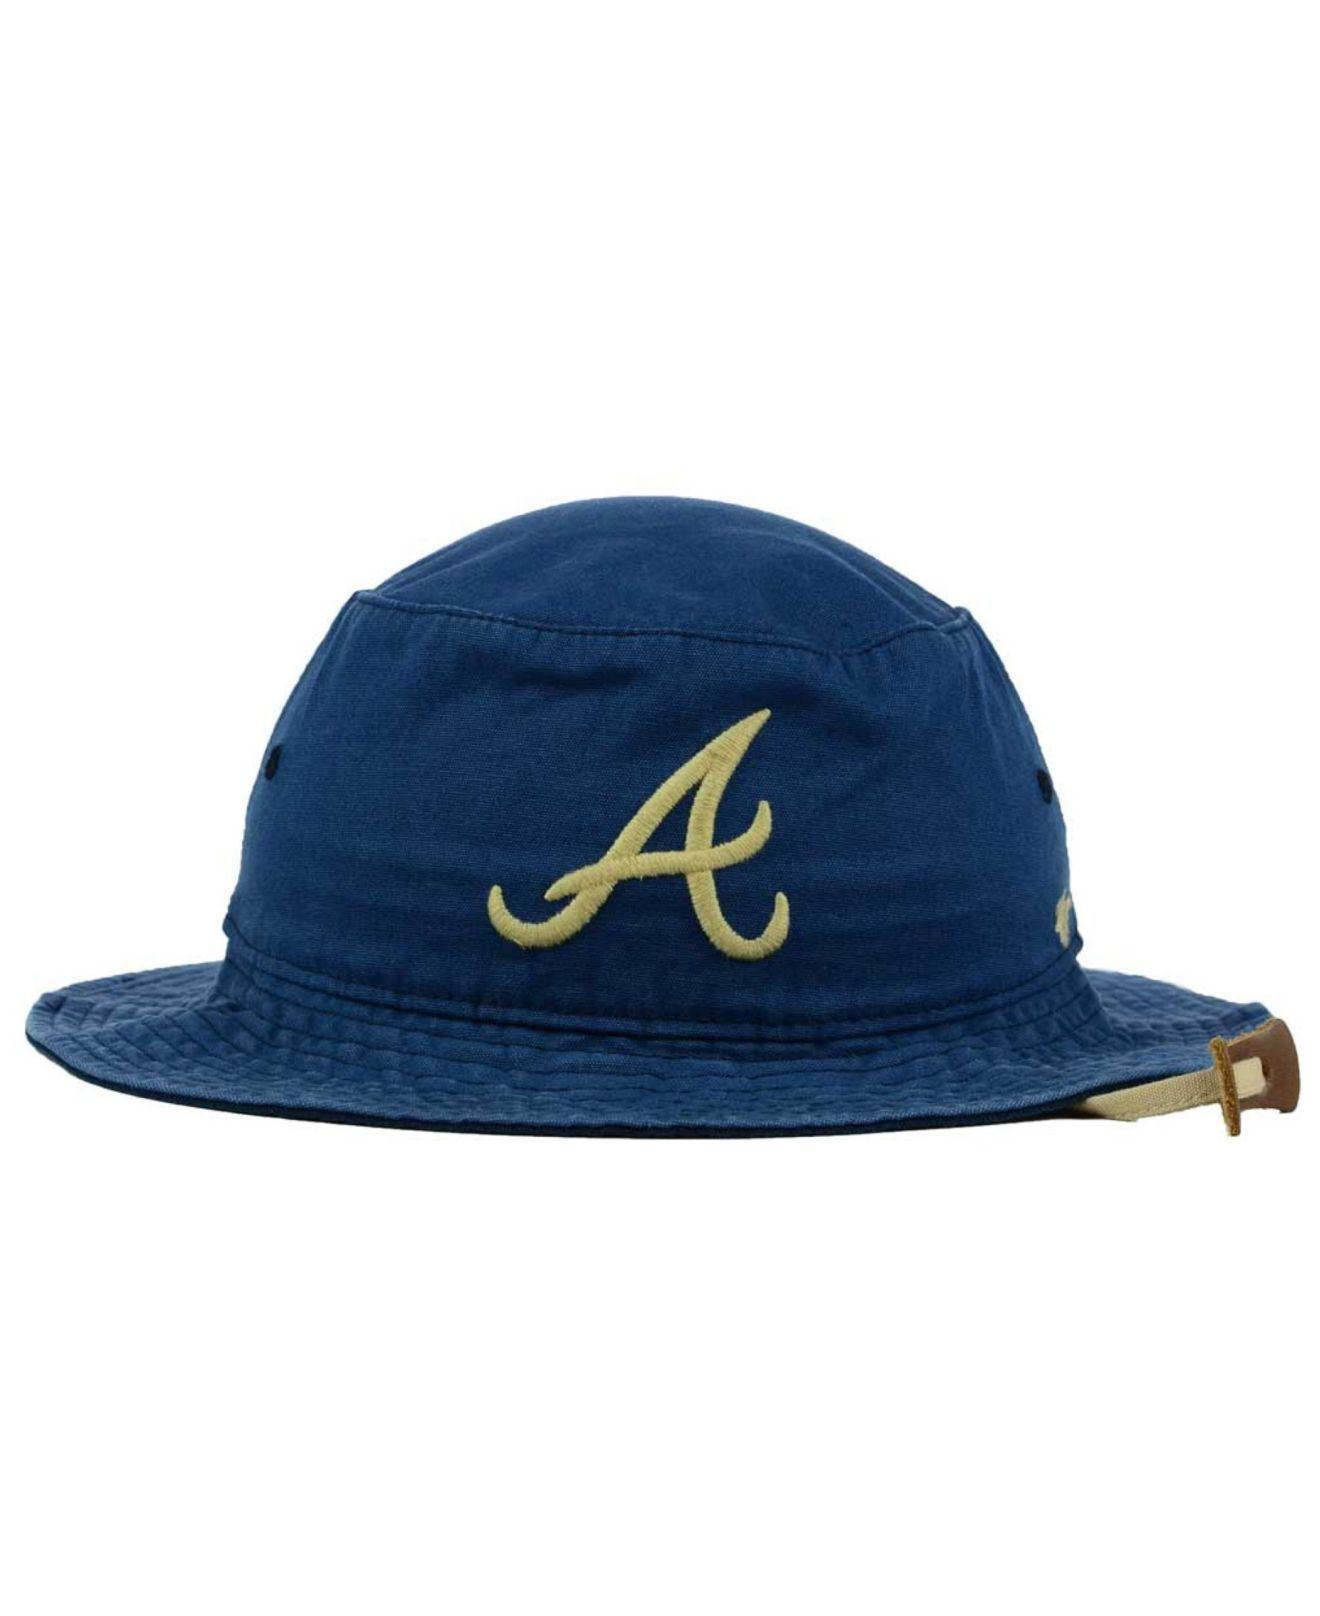 official photos 55db0 26f30 Lyst - 47 Brand Atlanta Braves Fever Dog Bucket Hat in Blue